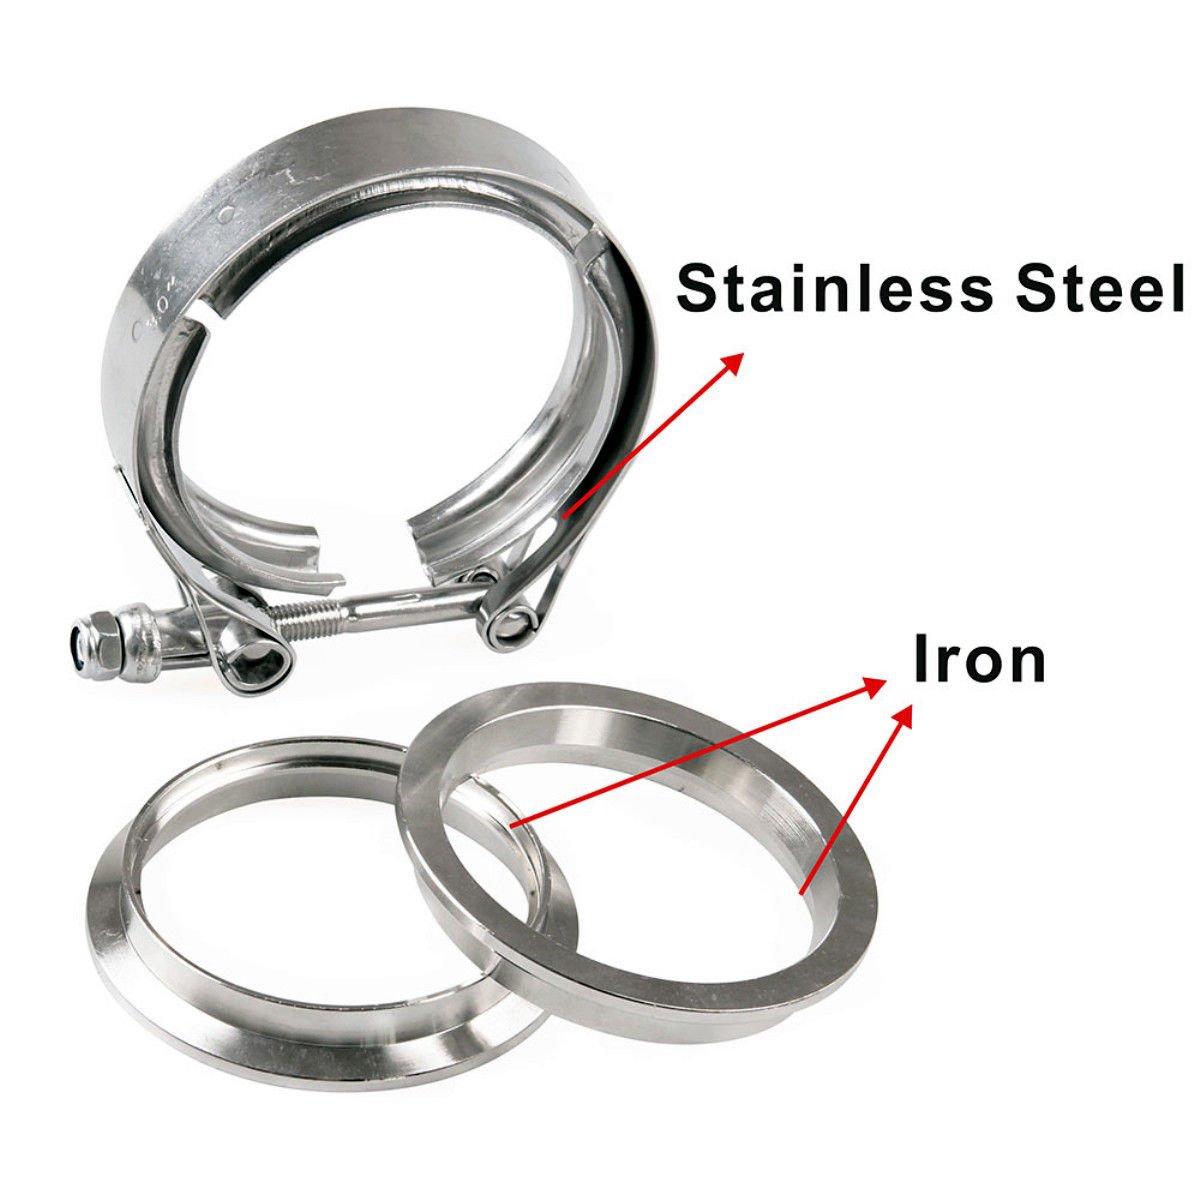 MASO 3 Inch Innet 76mm V Band Clamp /& Flange Kit Male /& Female Set Fittings SS304 Stainless Steel V Band Flat Flange Clamp Kit Assembly